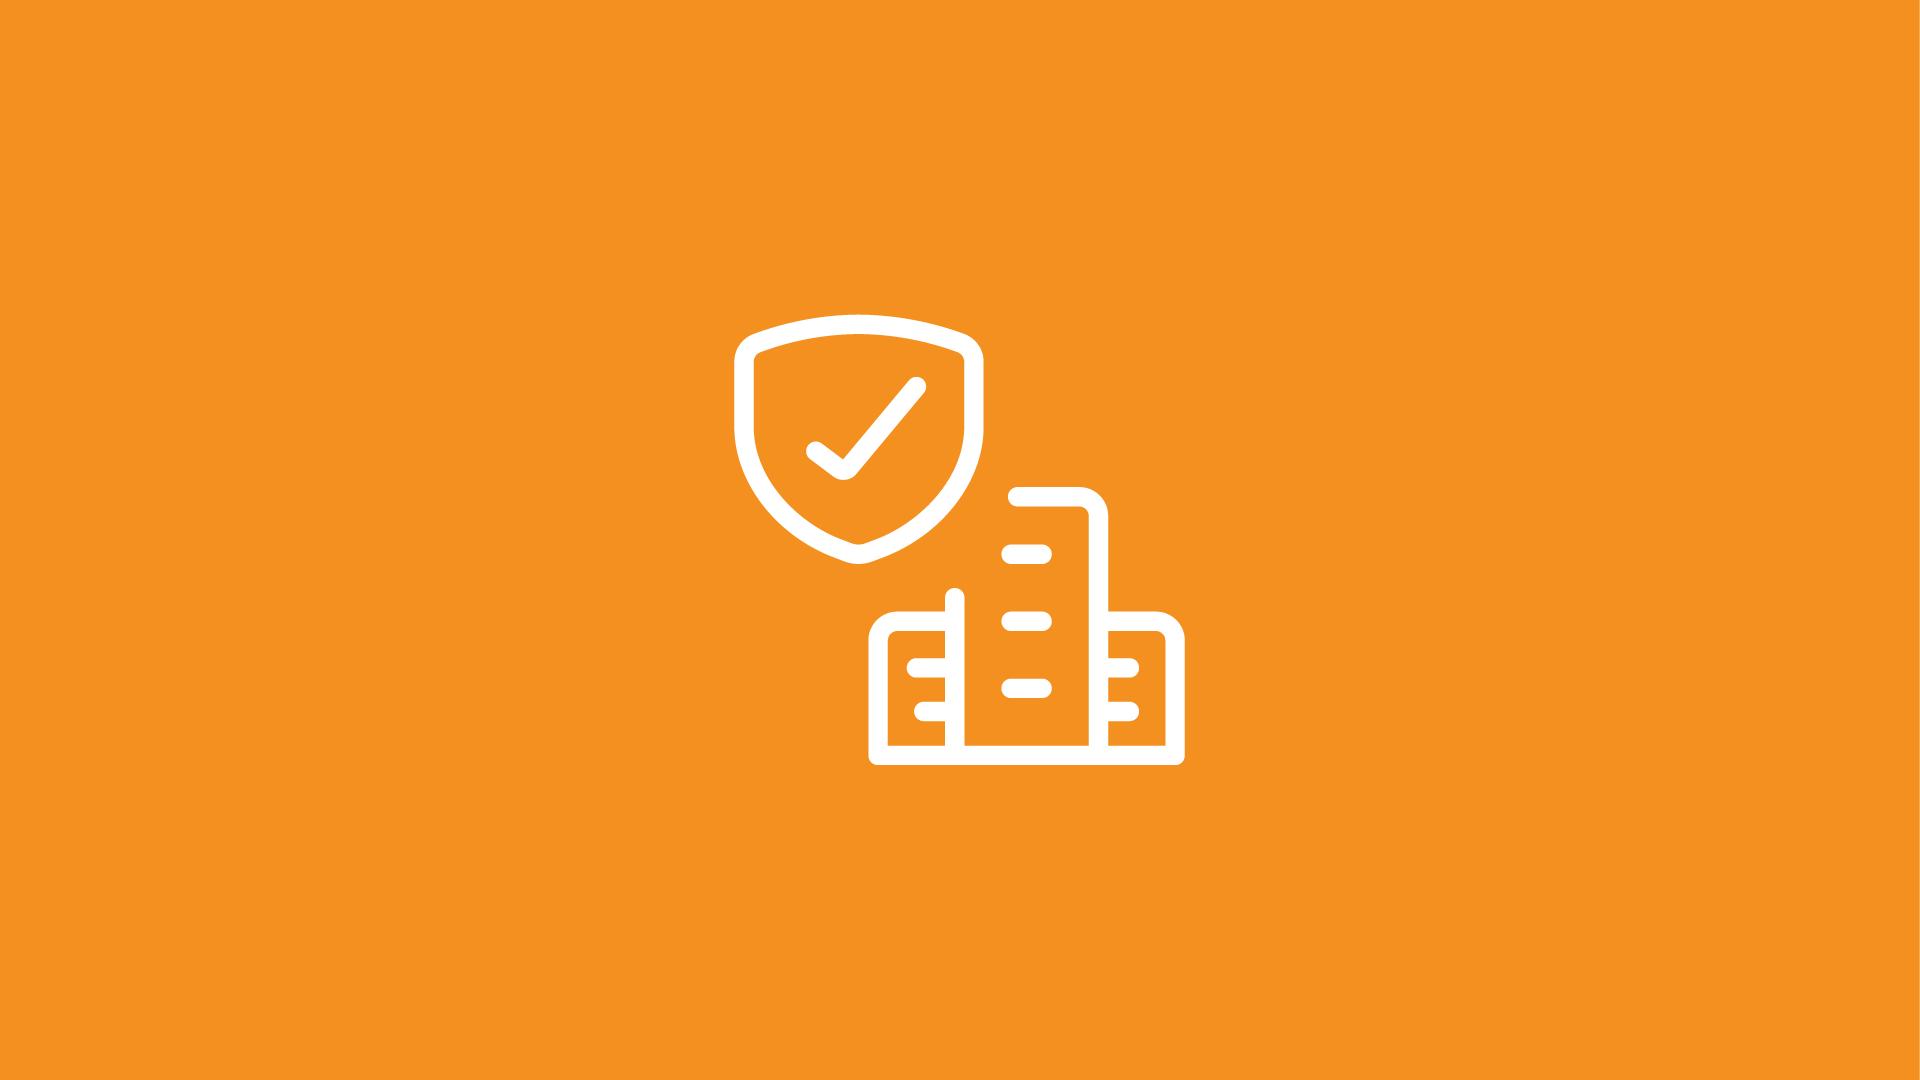 Site sssp management Software Icon